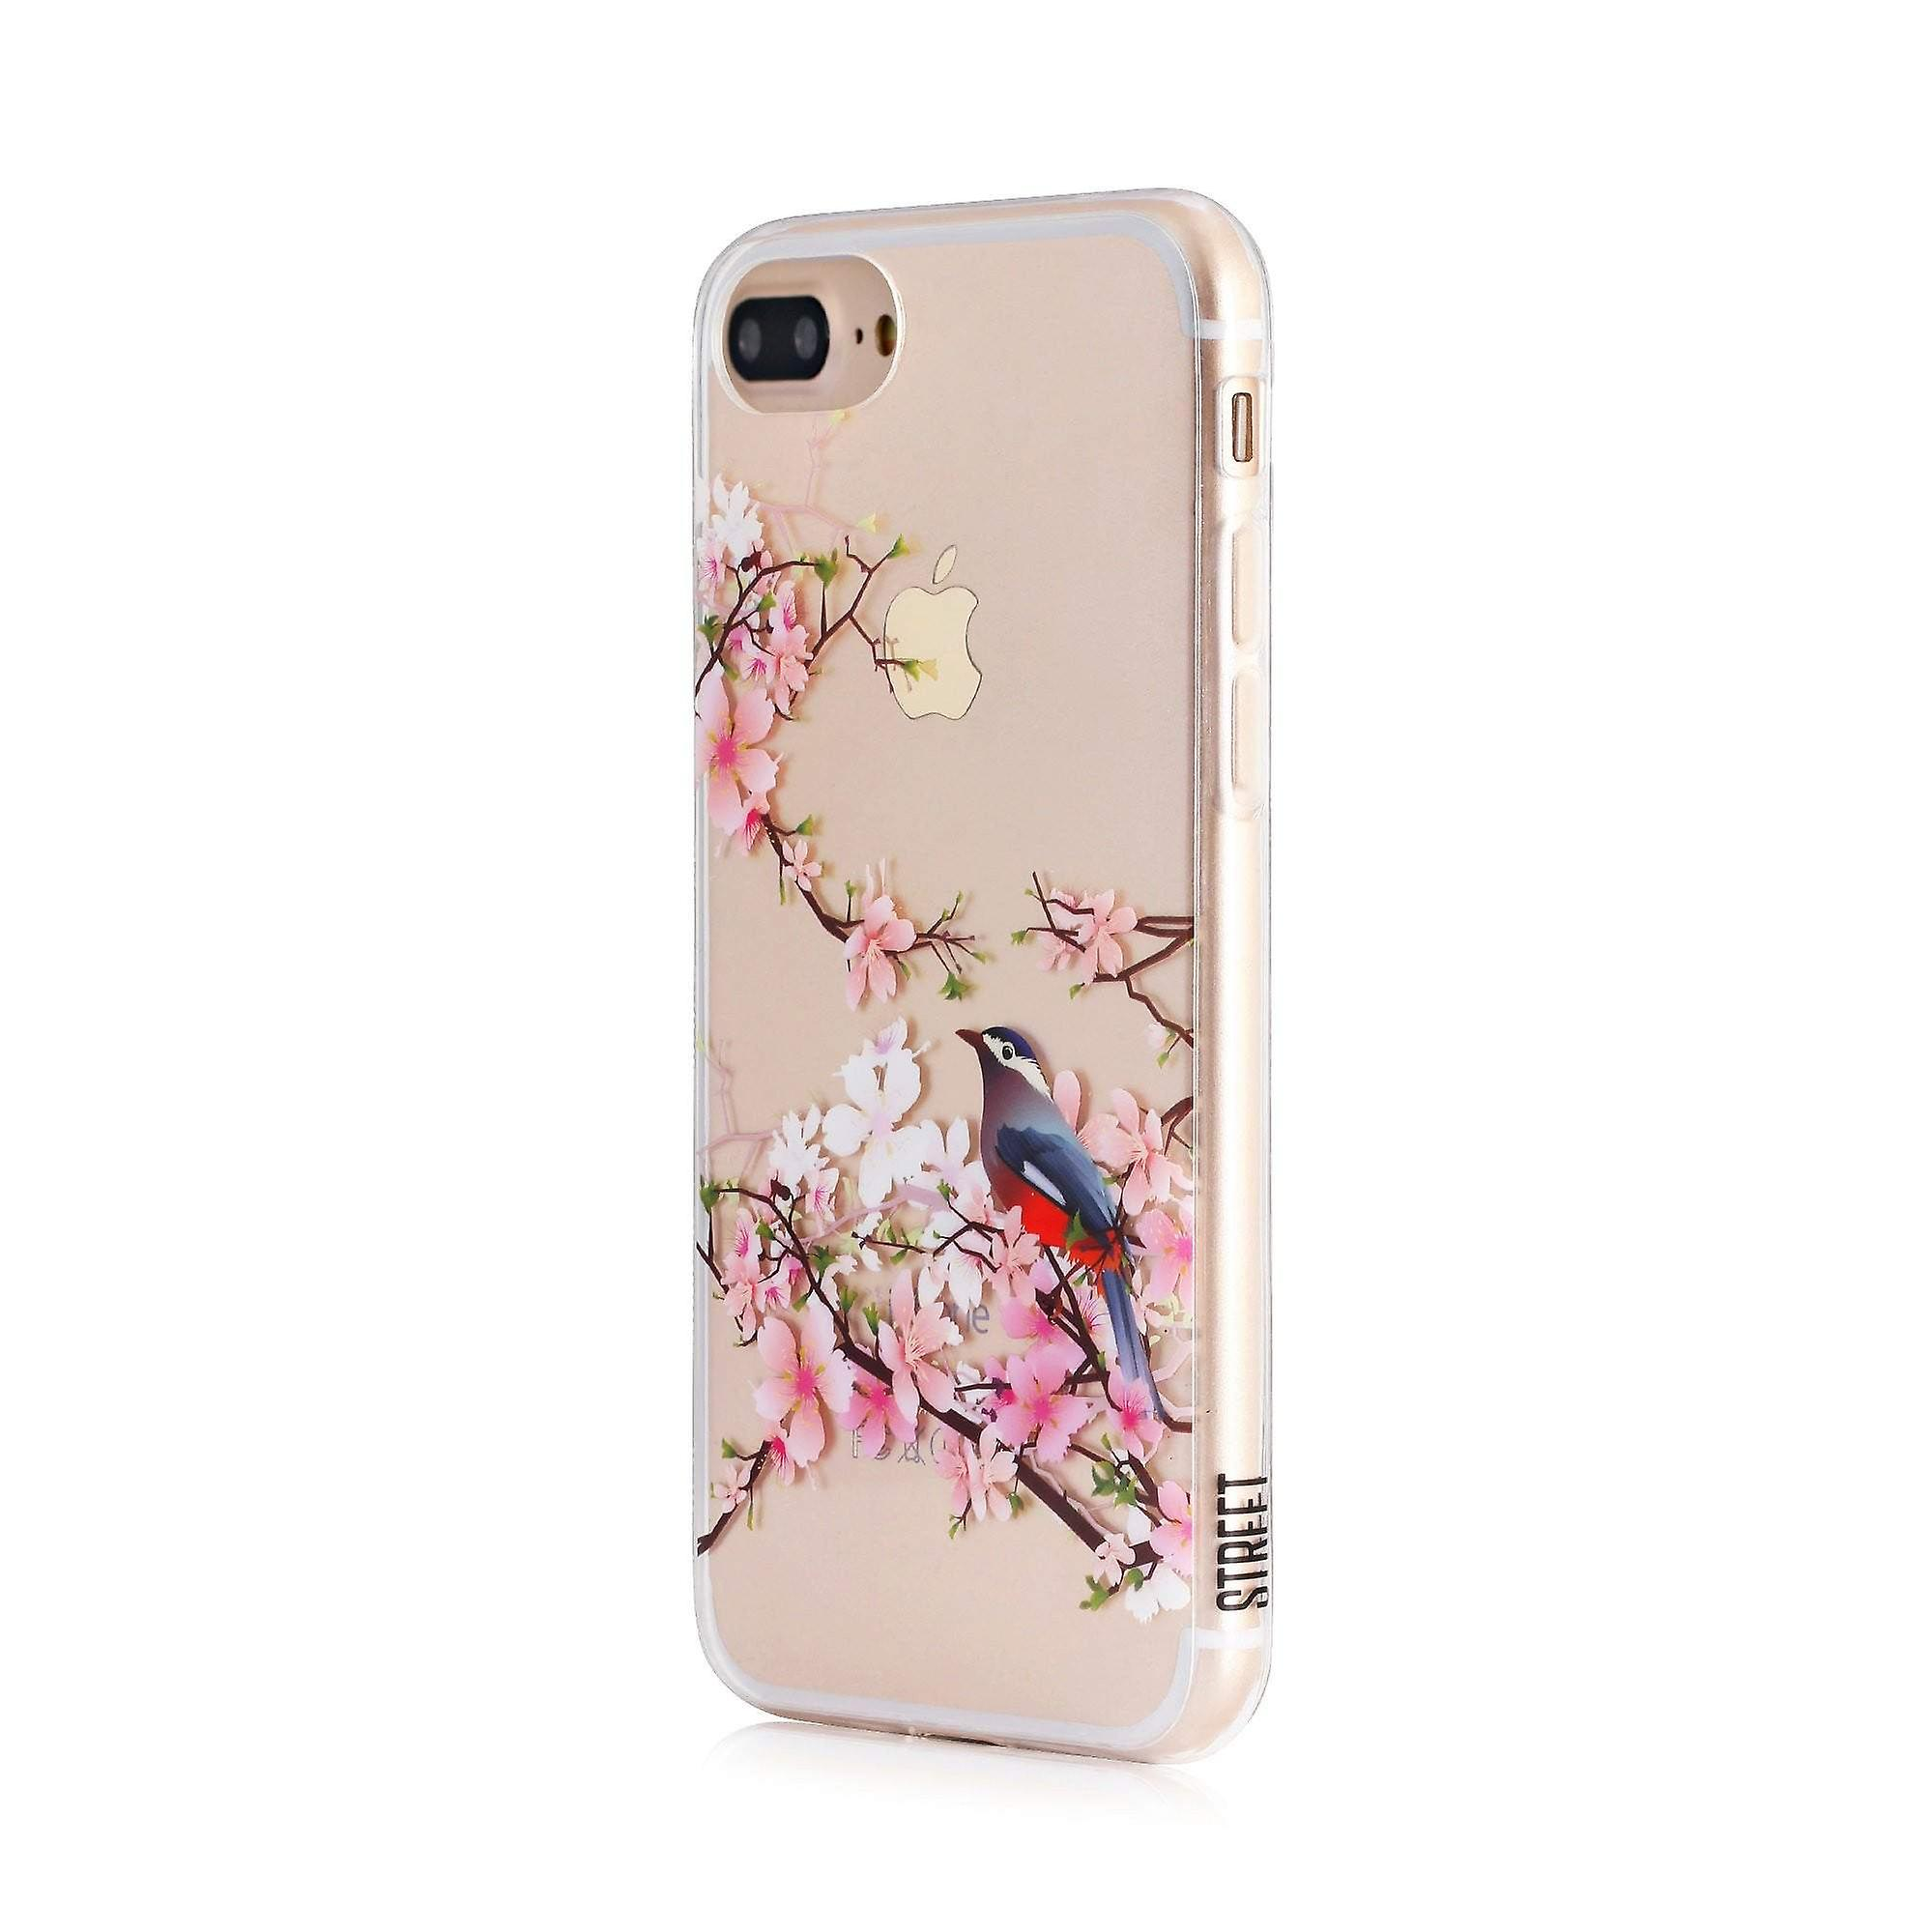 Printed Floral Bird Clear iPhone 8 Plus / 7 Plus Case